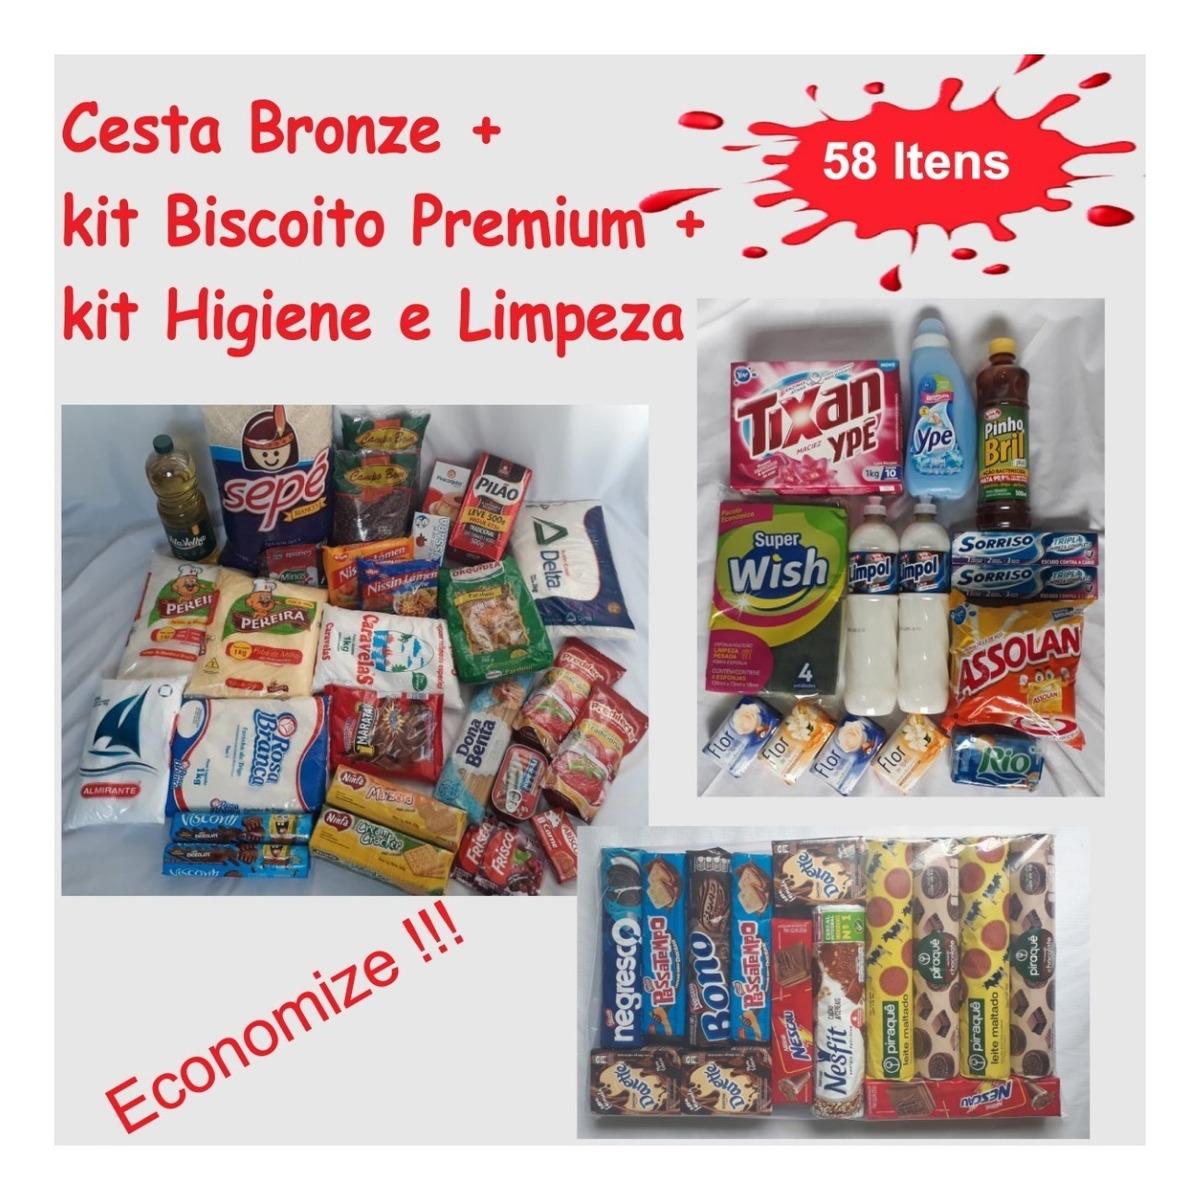 eaf80a5506 Cesta Básica Bronze + Kit Biscoito + Kit Limpeza - 61 Itens - R$ 300 ...